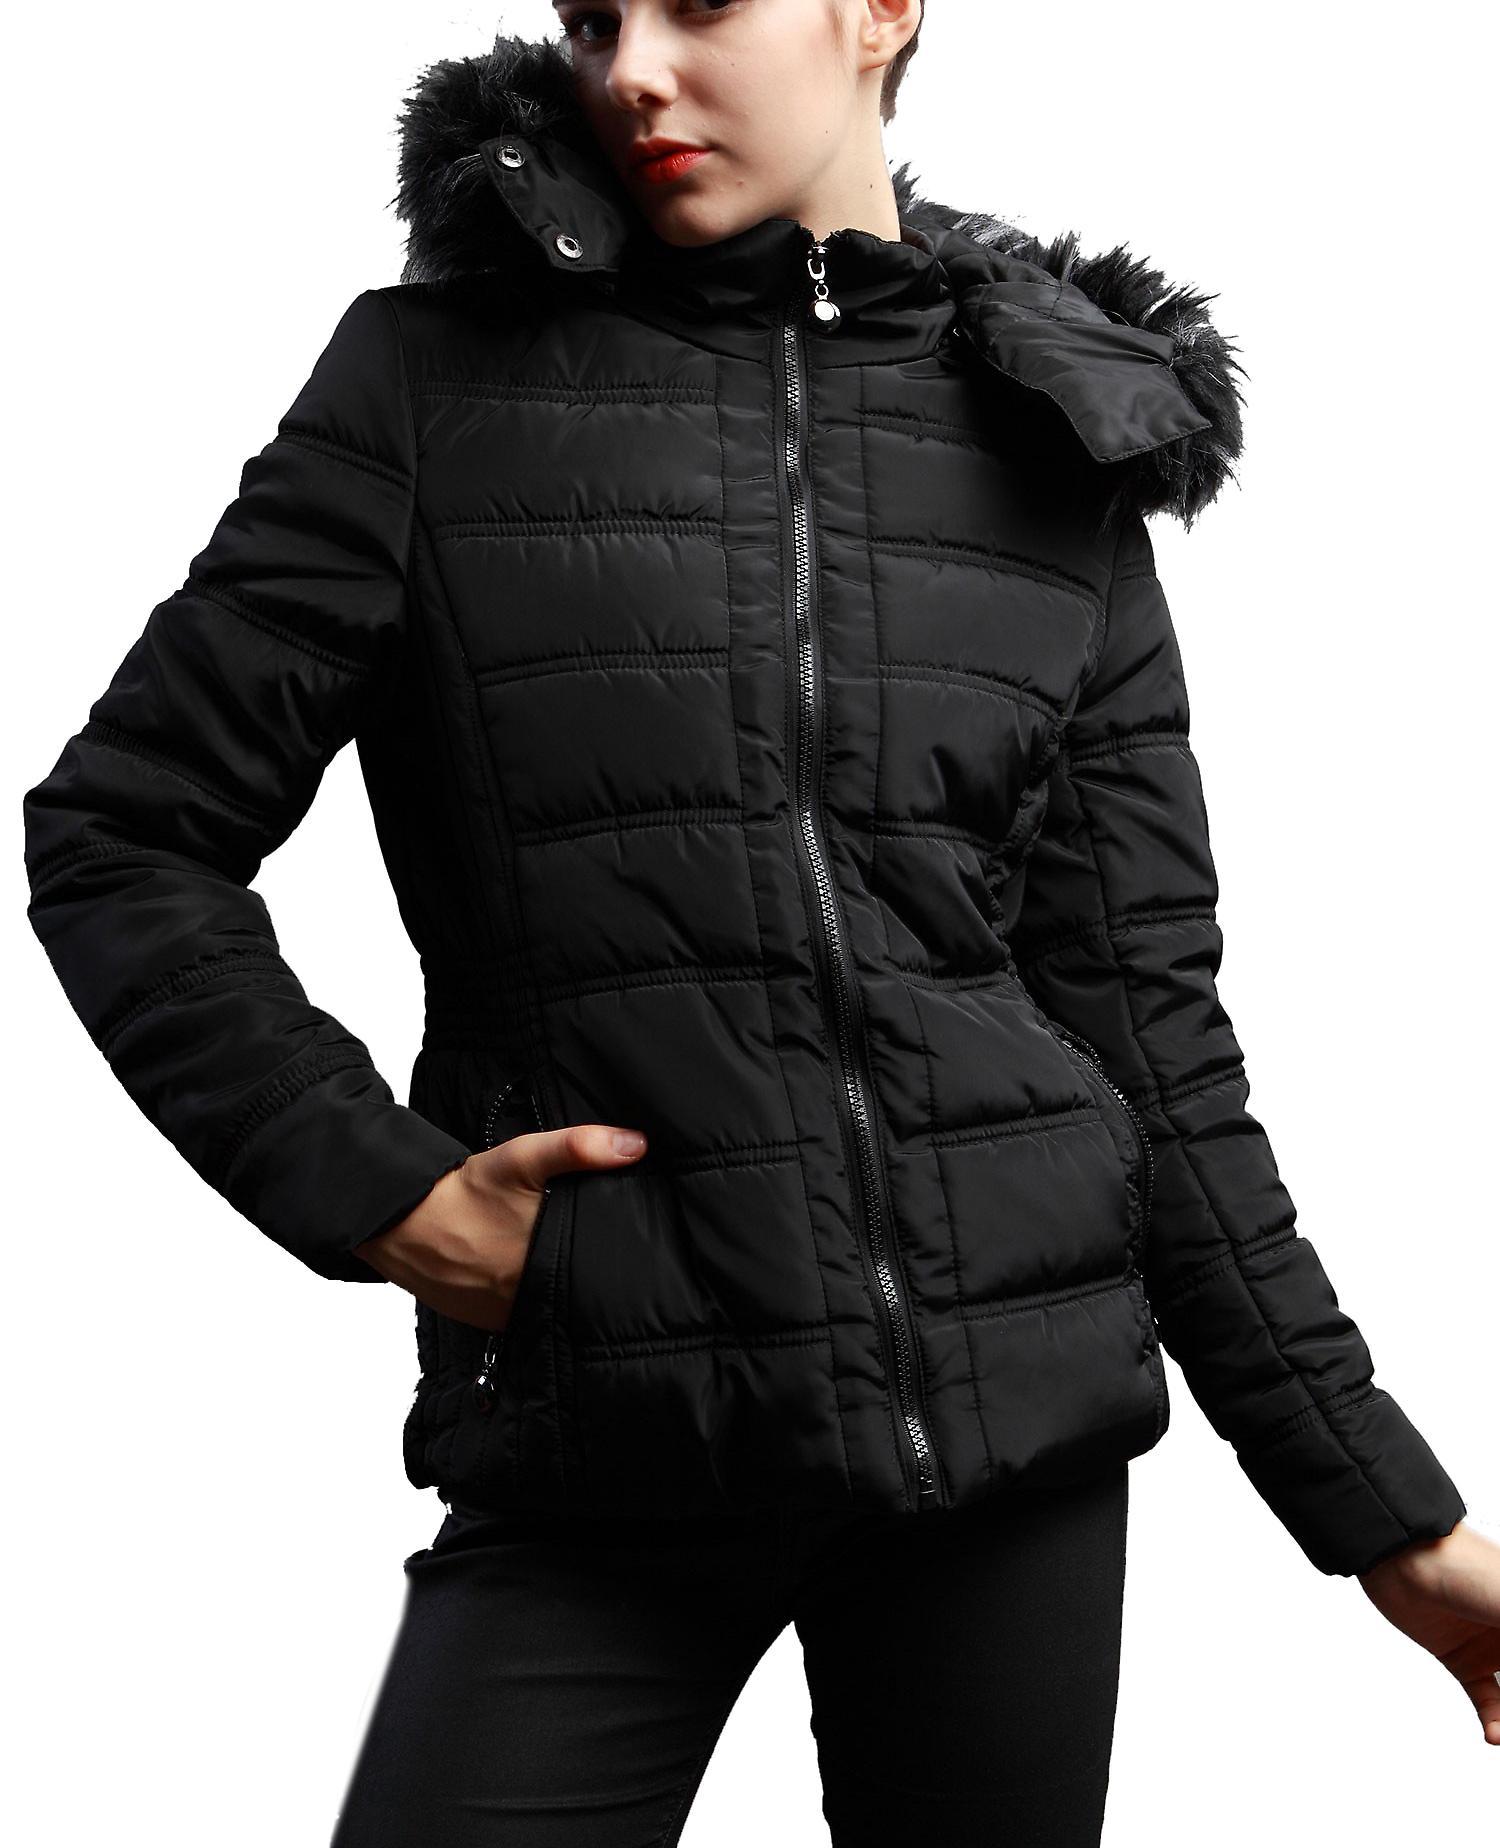 Waooh - Removable hood Jacket Stili